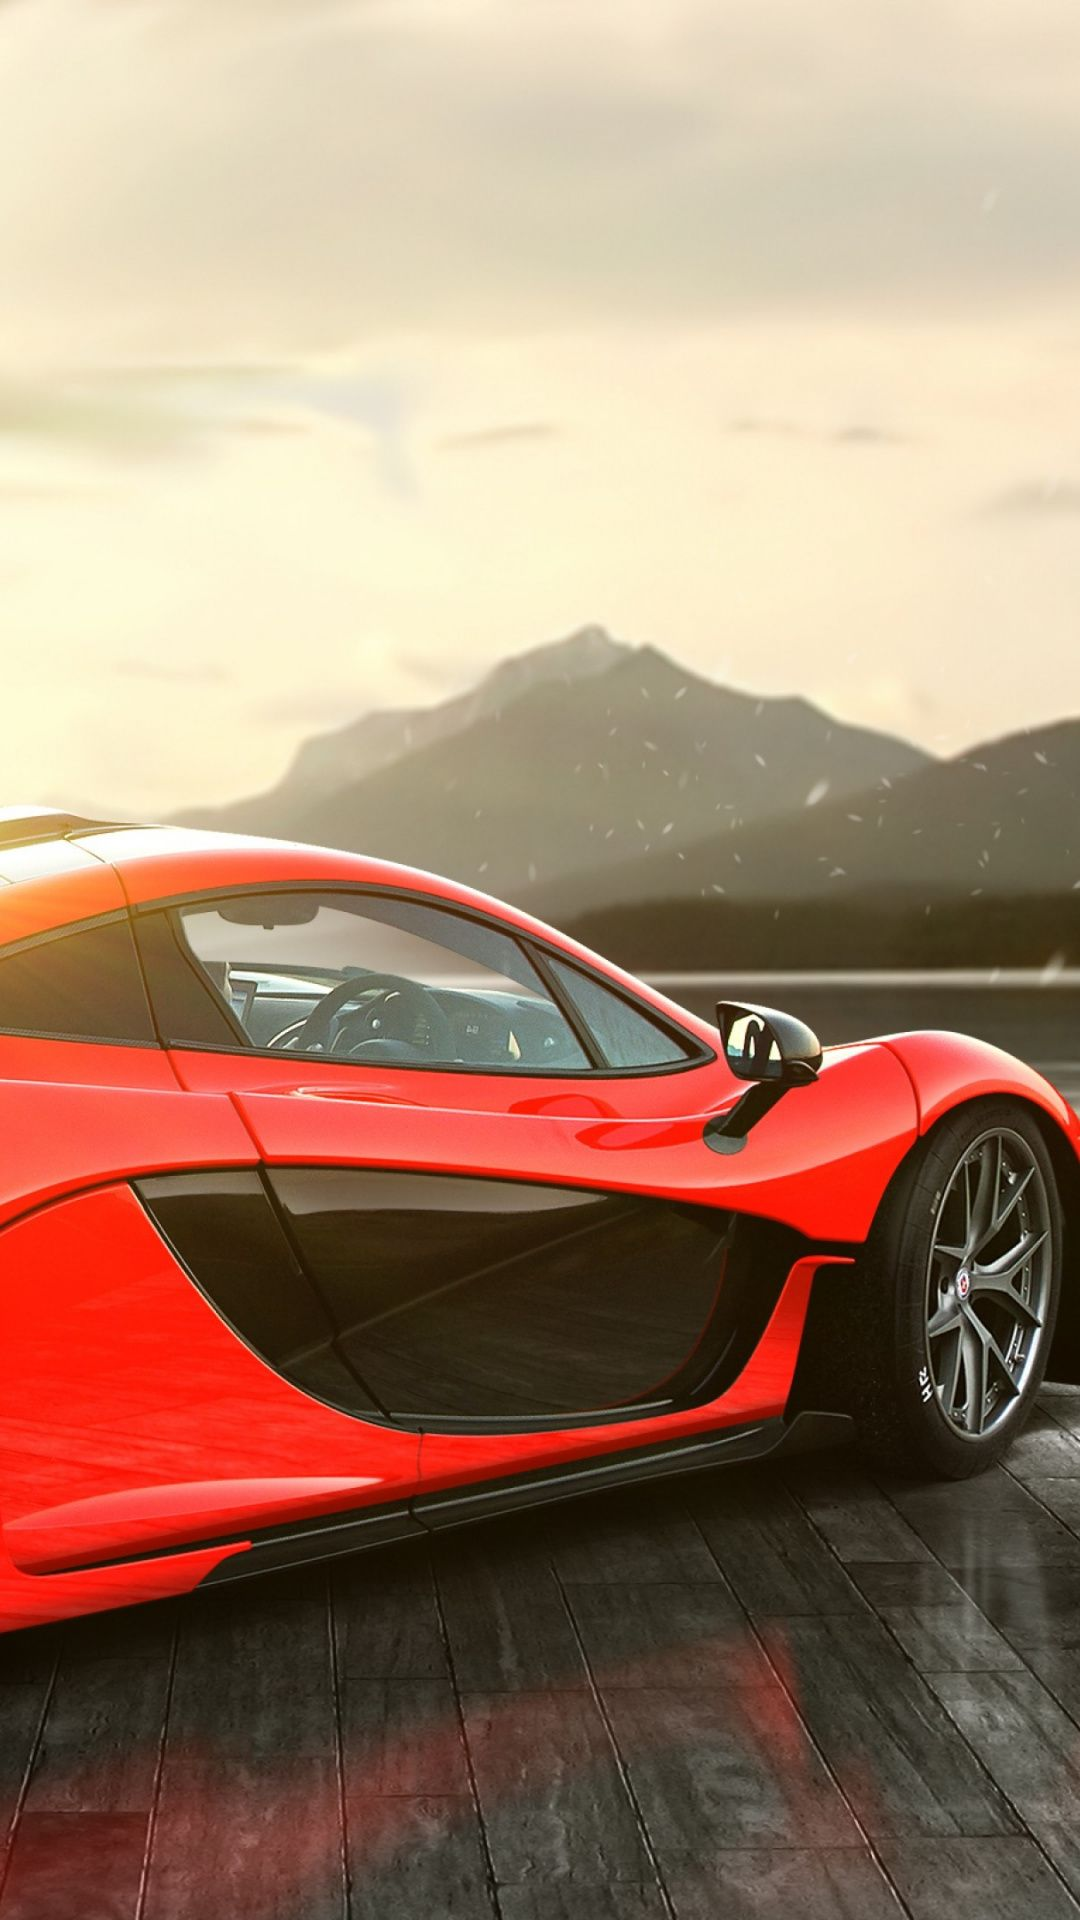 Download 1080x1920 Wallpaper Race Car Mclaren Supercar Gps Navigation Systems Sportscar Super Cars Cars Ferrari 458 Italia